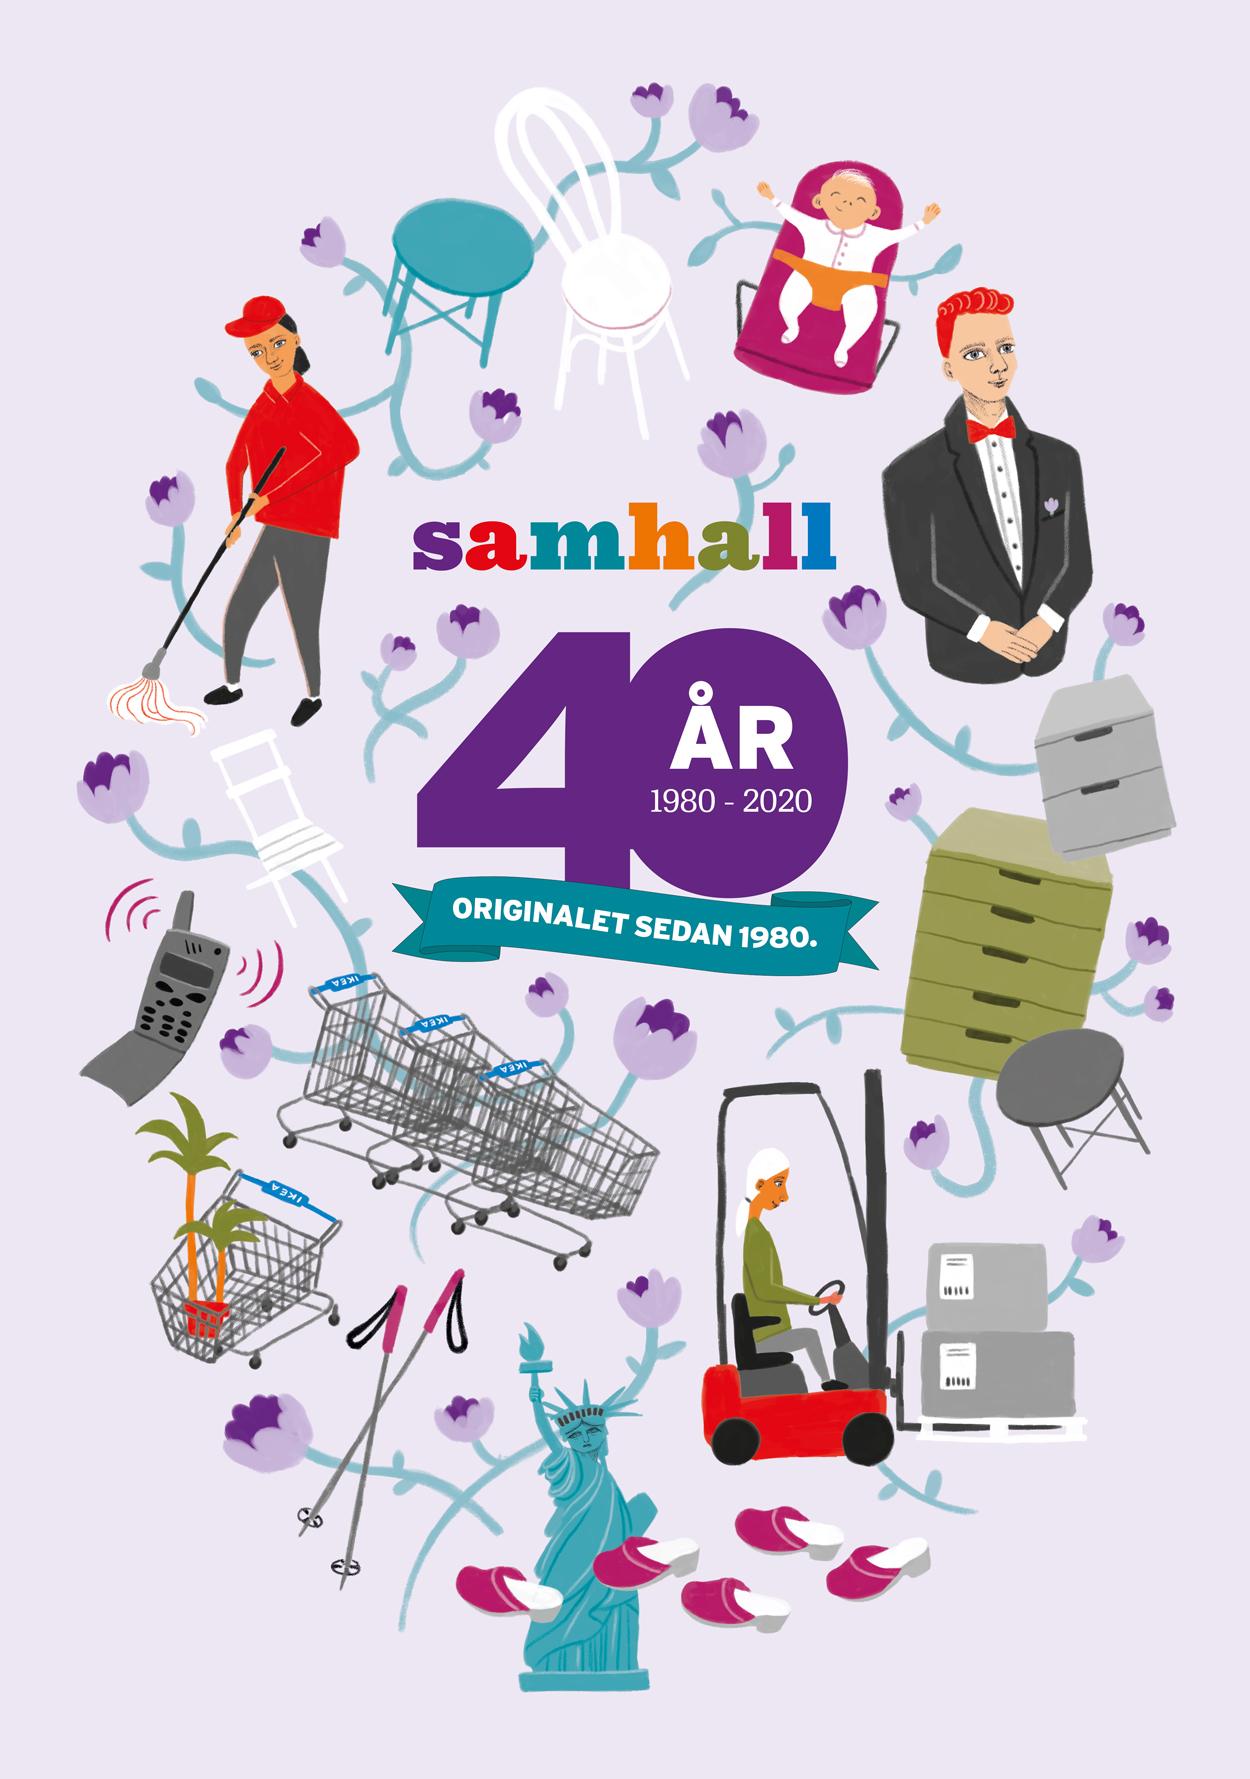 samhall_40-miaolofsson-cover